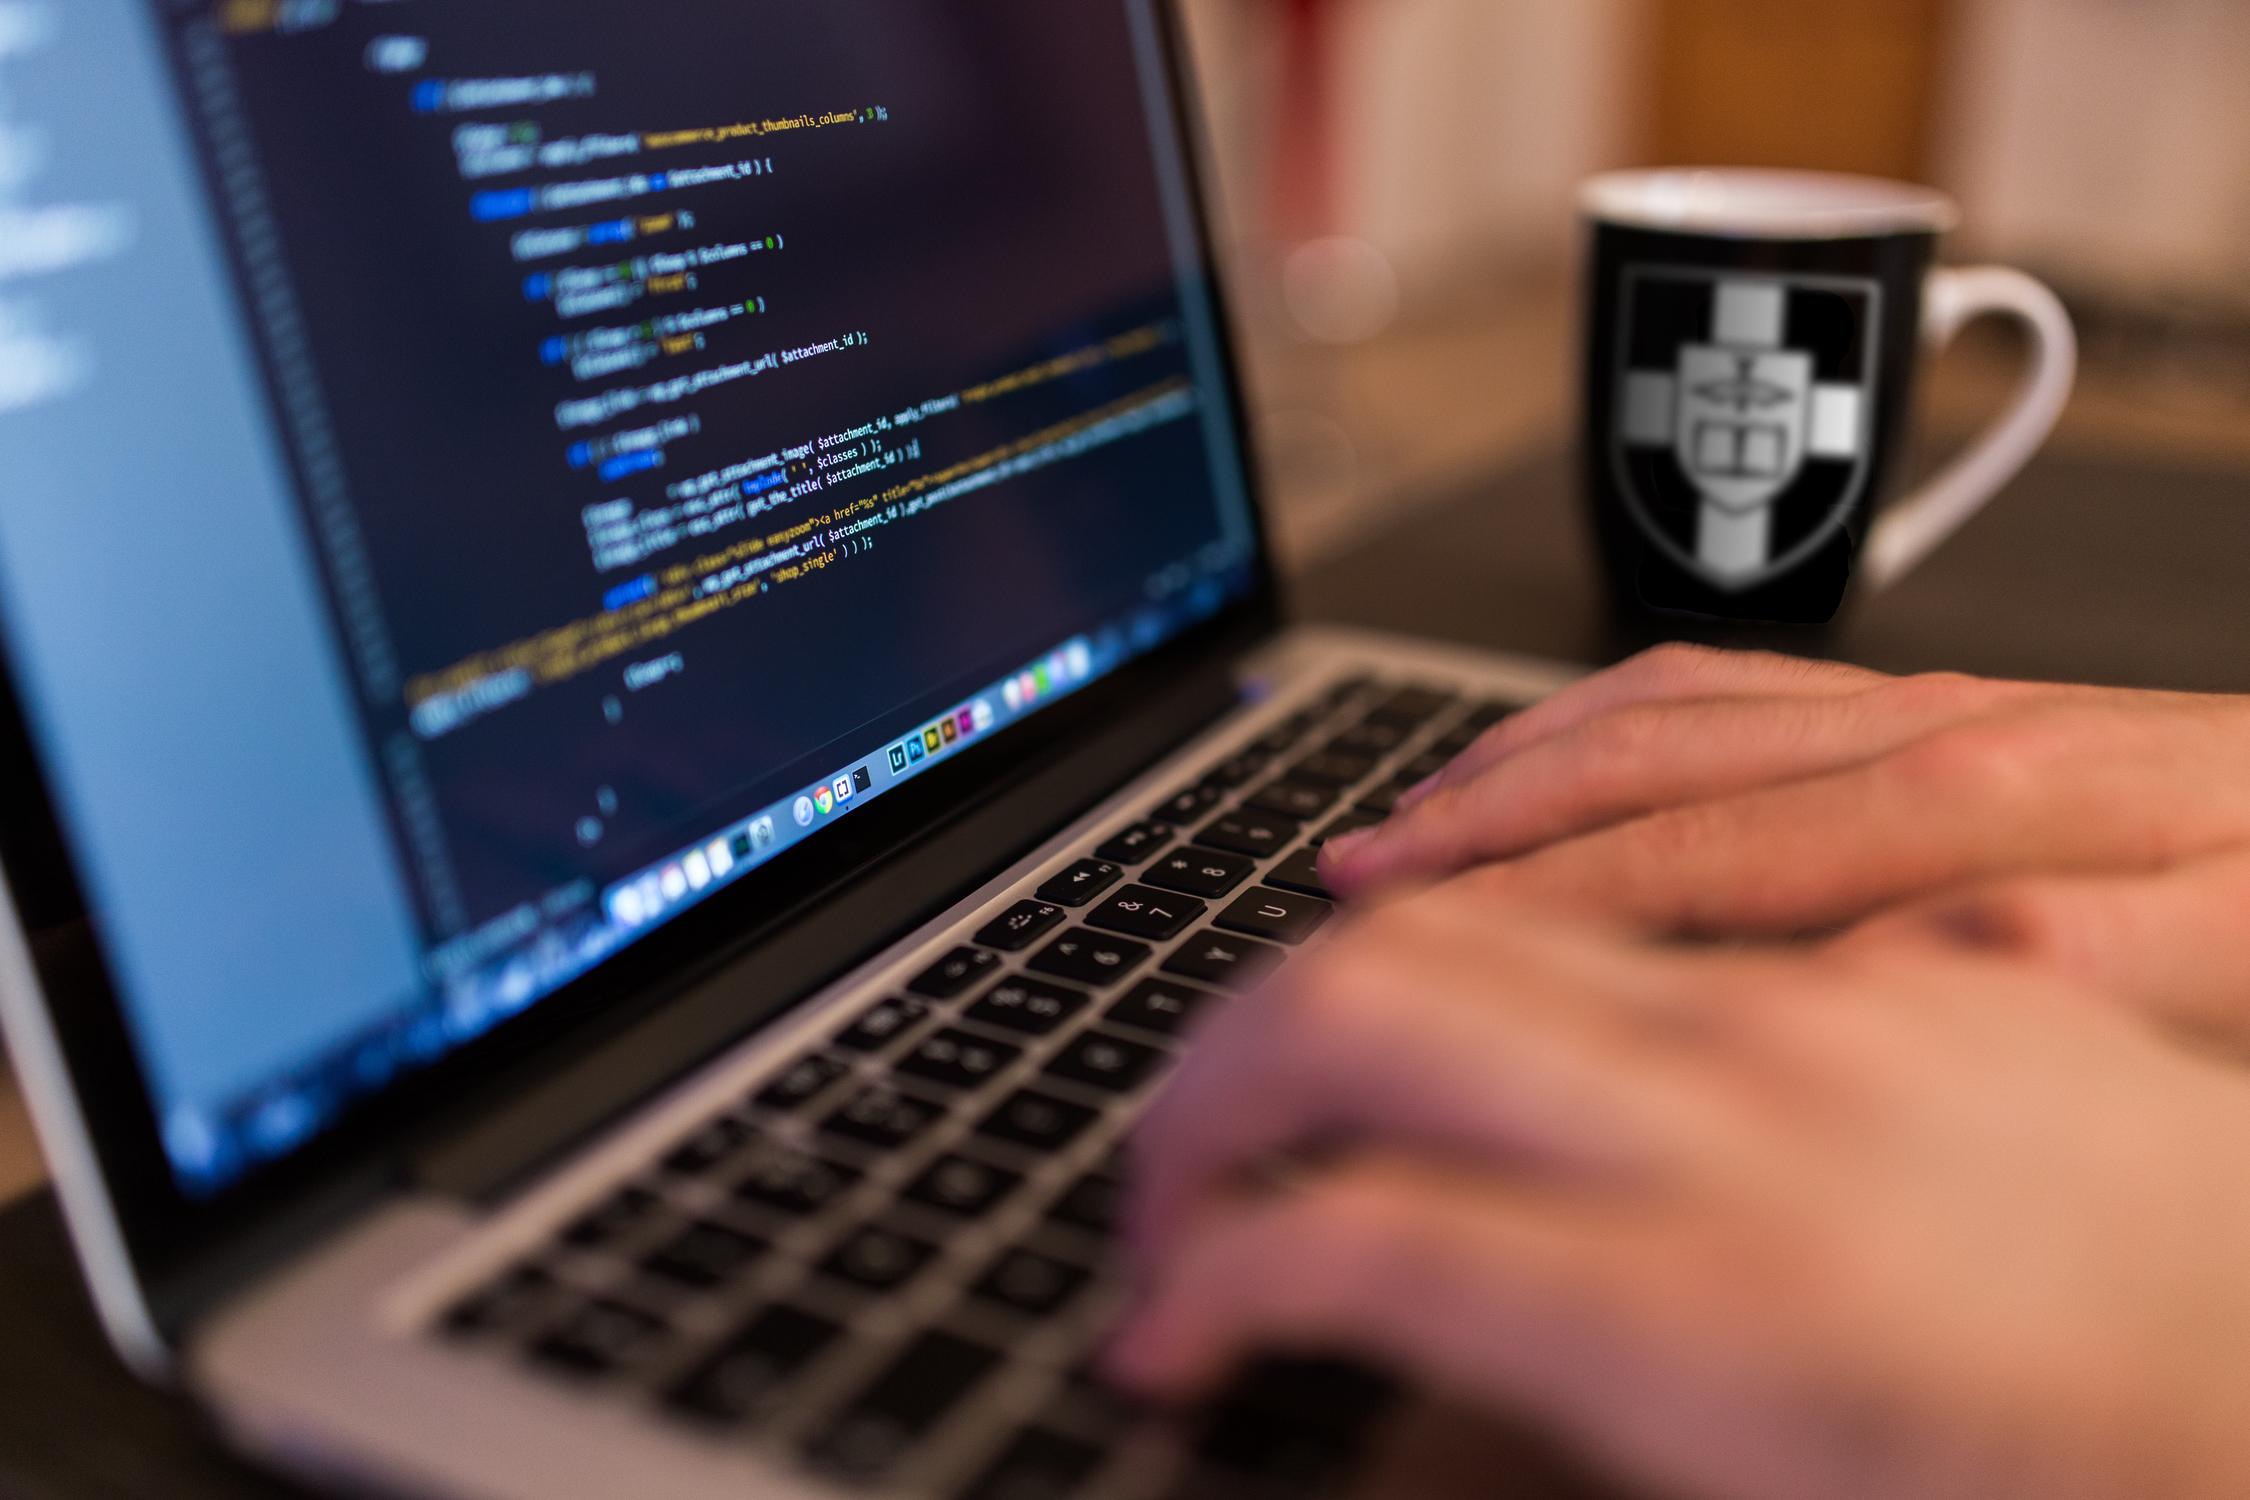 Hands at laptop keyboard writing code